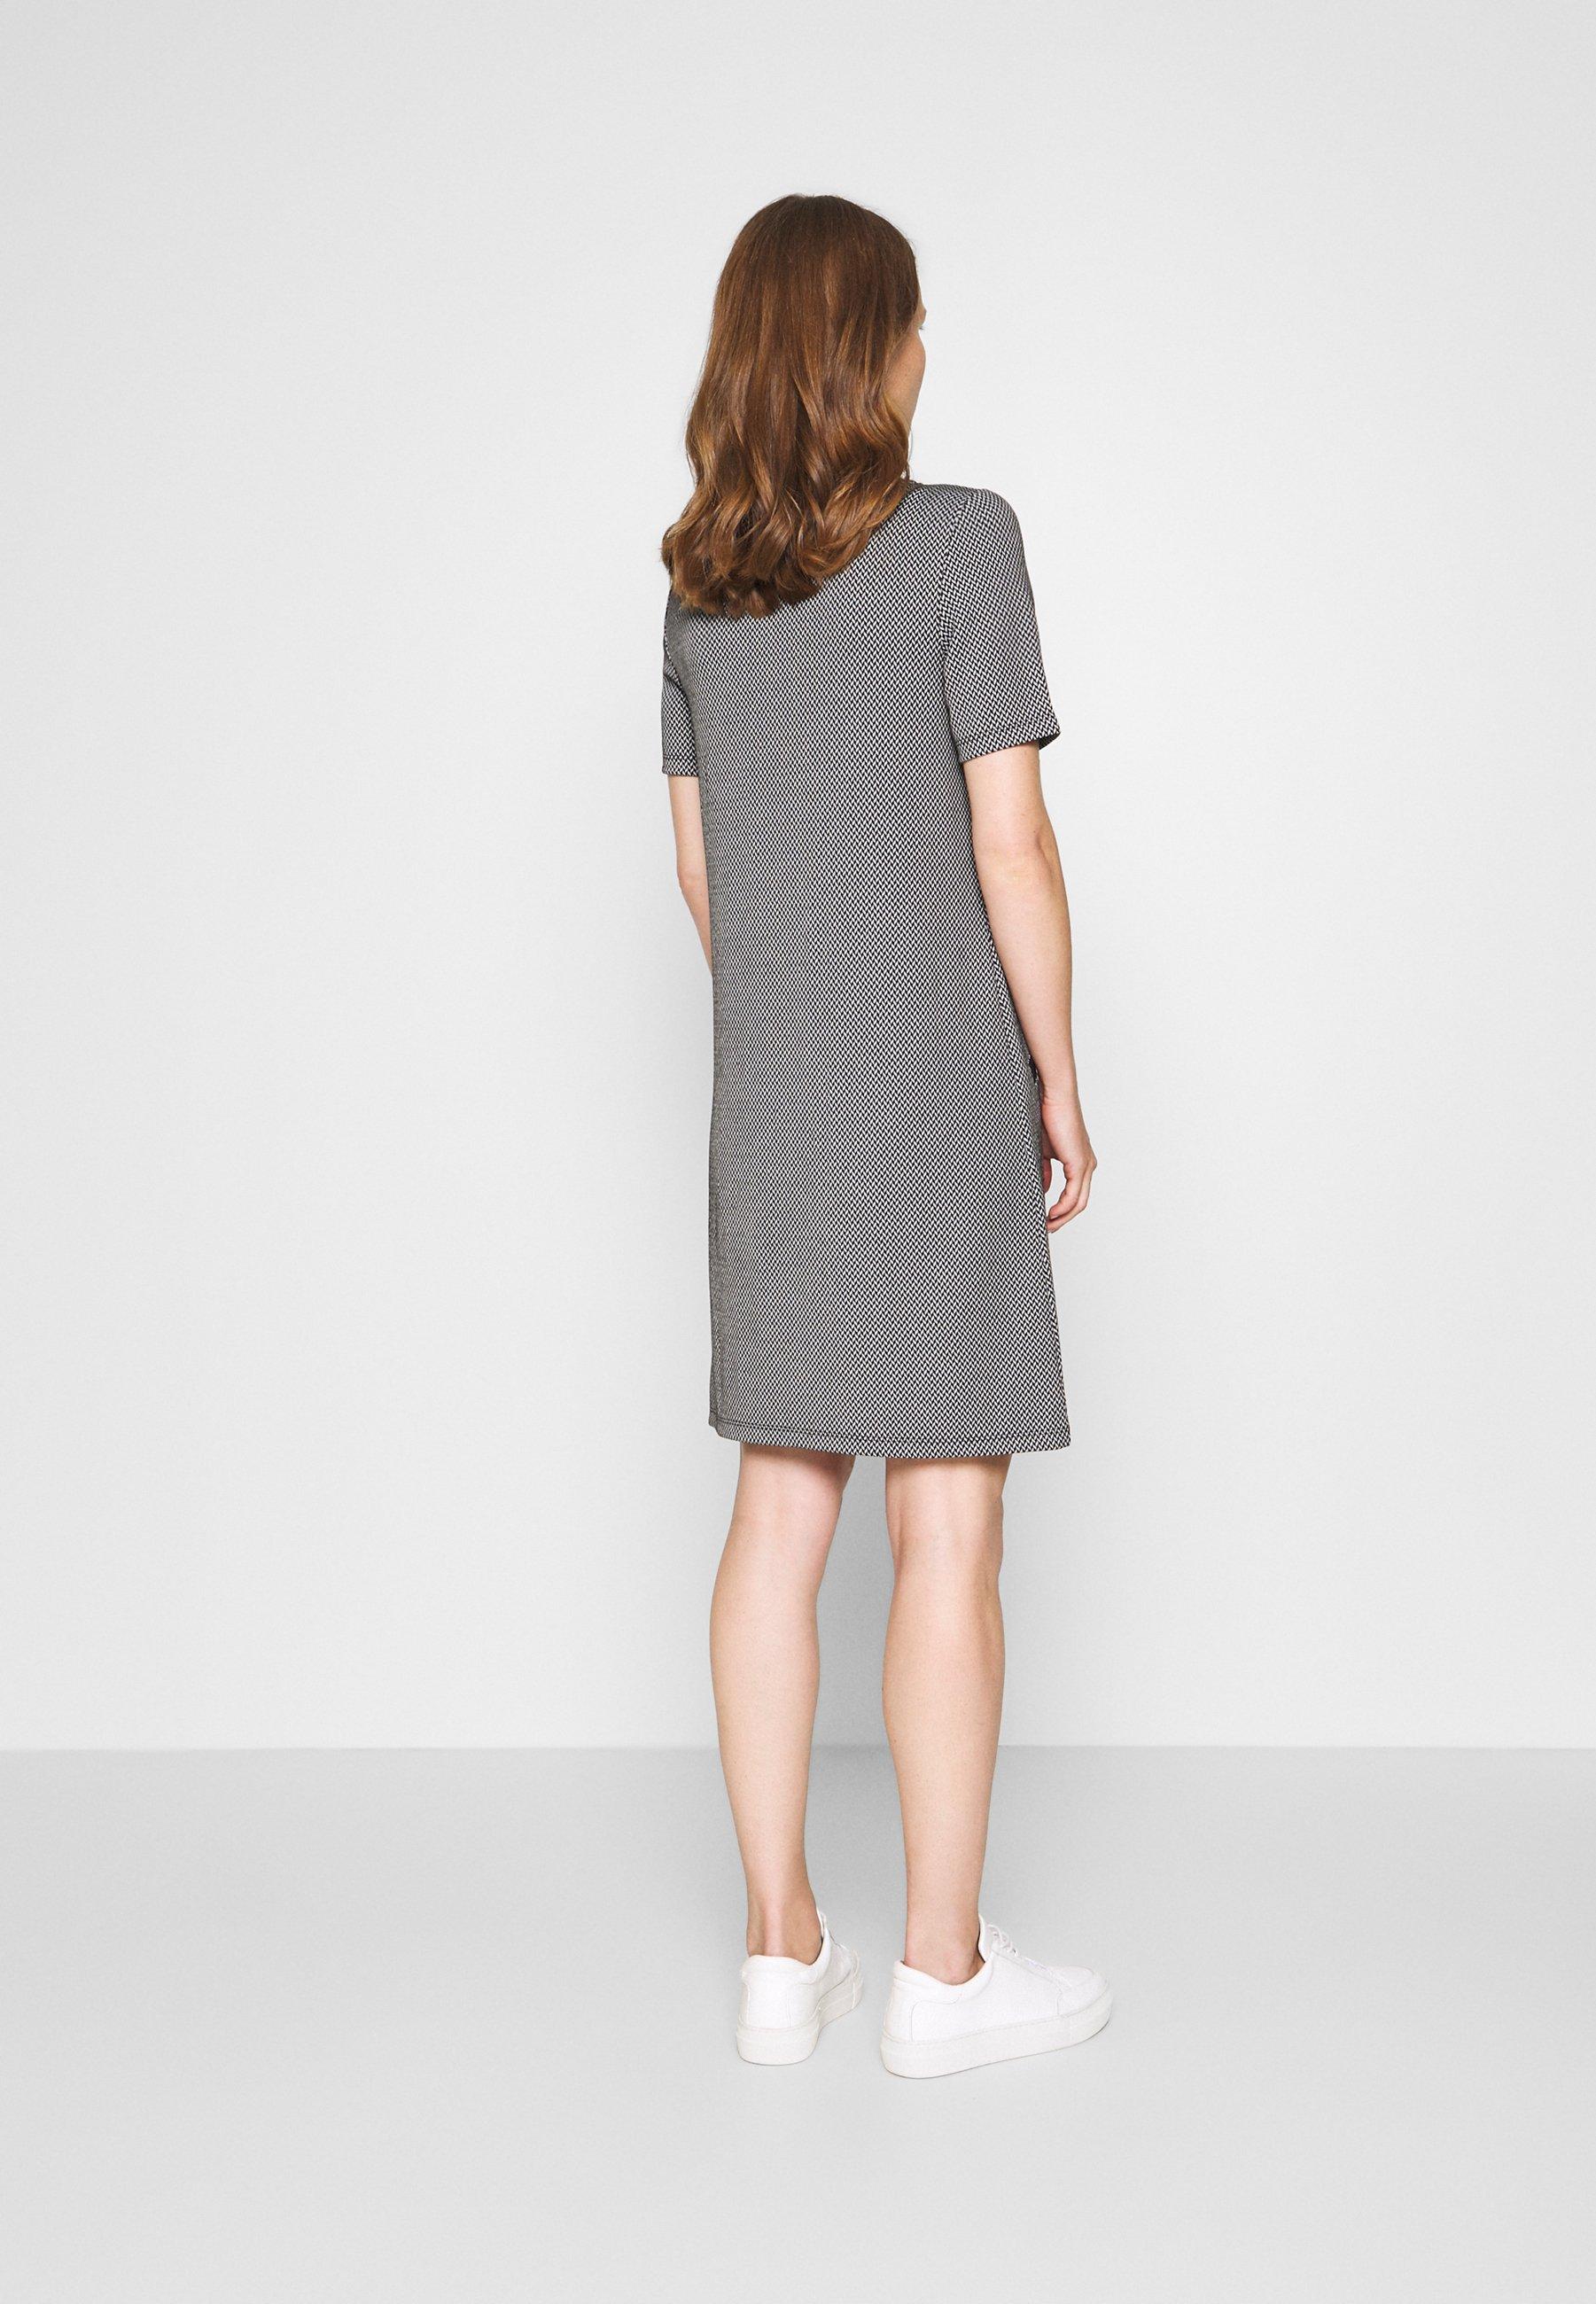 New Style Reliable Women's Clothing Esprit Day dress black OrNKTQvVZ NxtuuFm0K